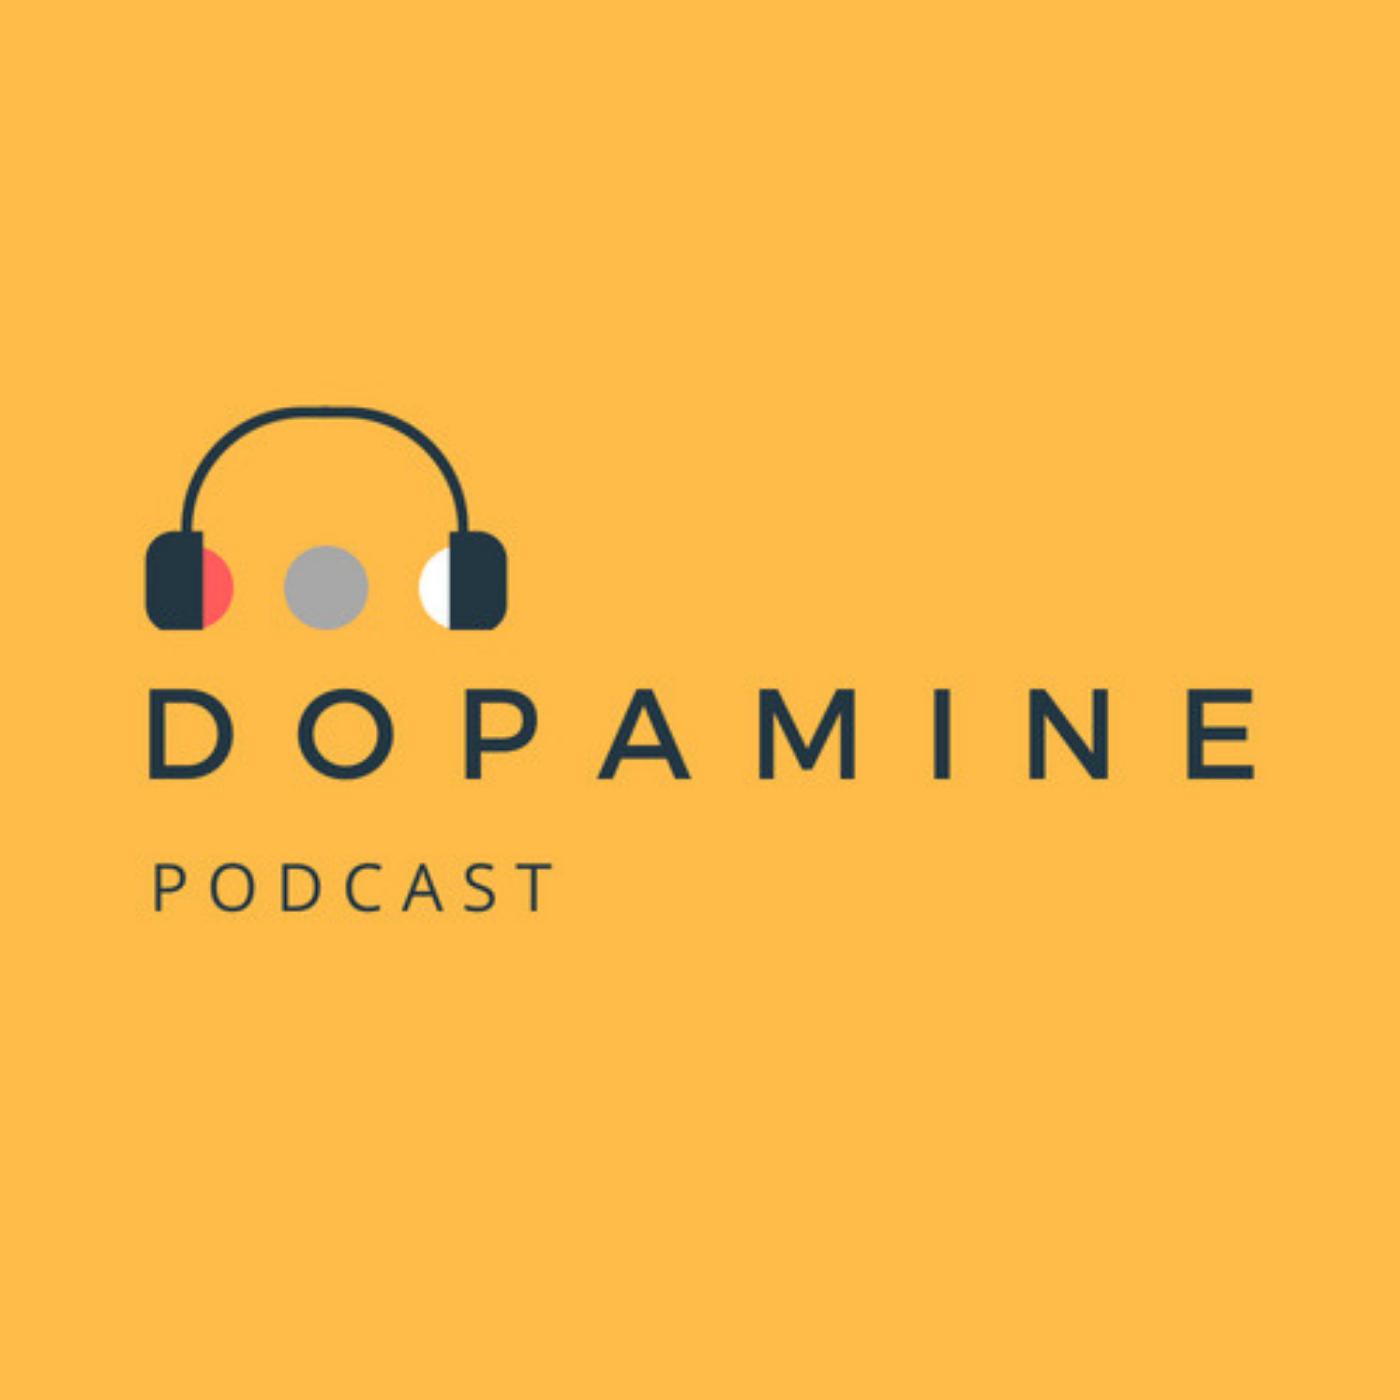 Dopamine Podcast show art